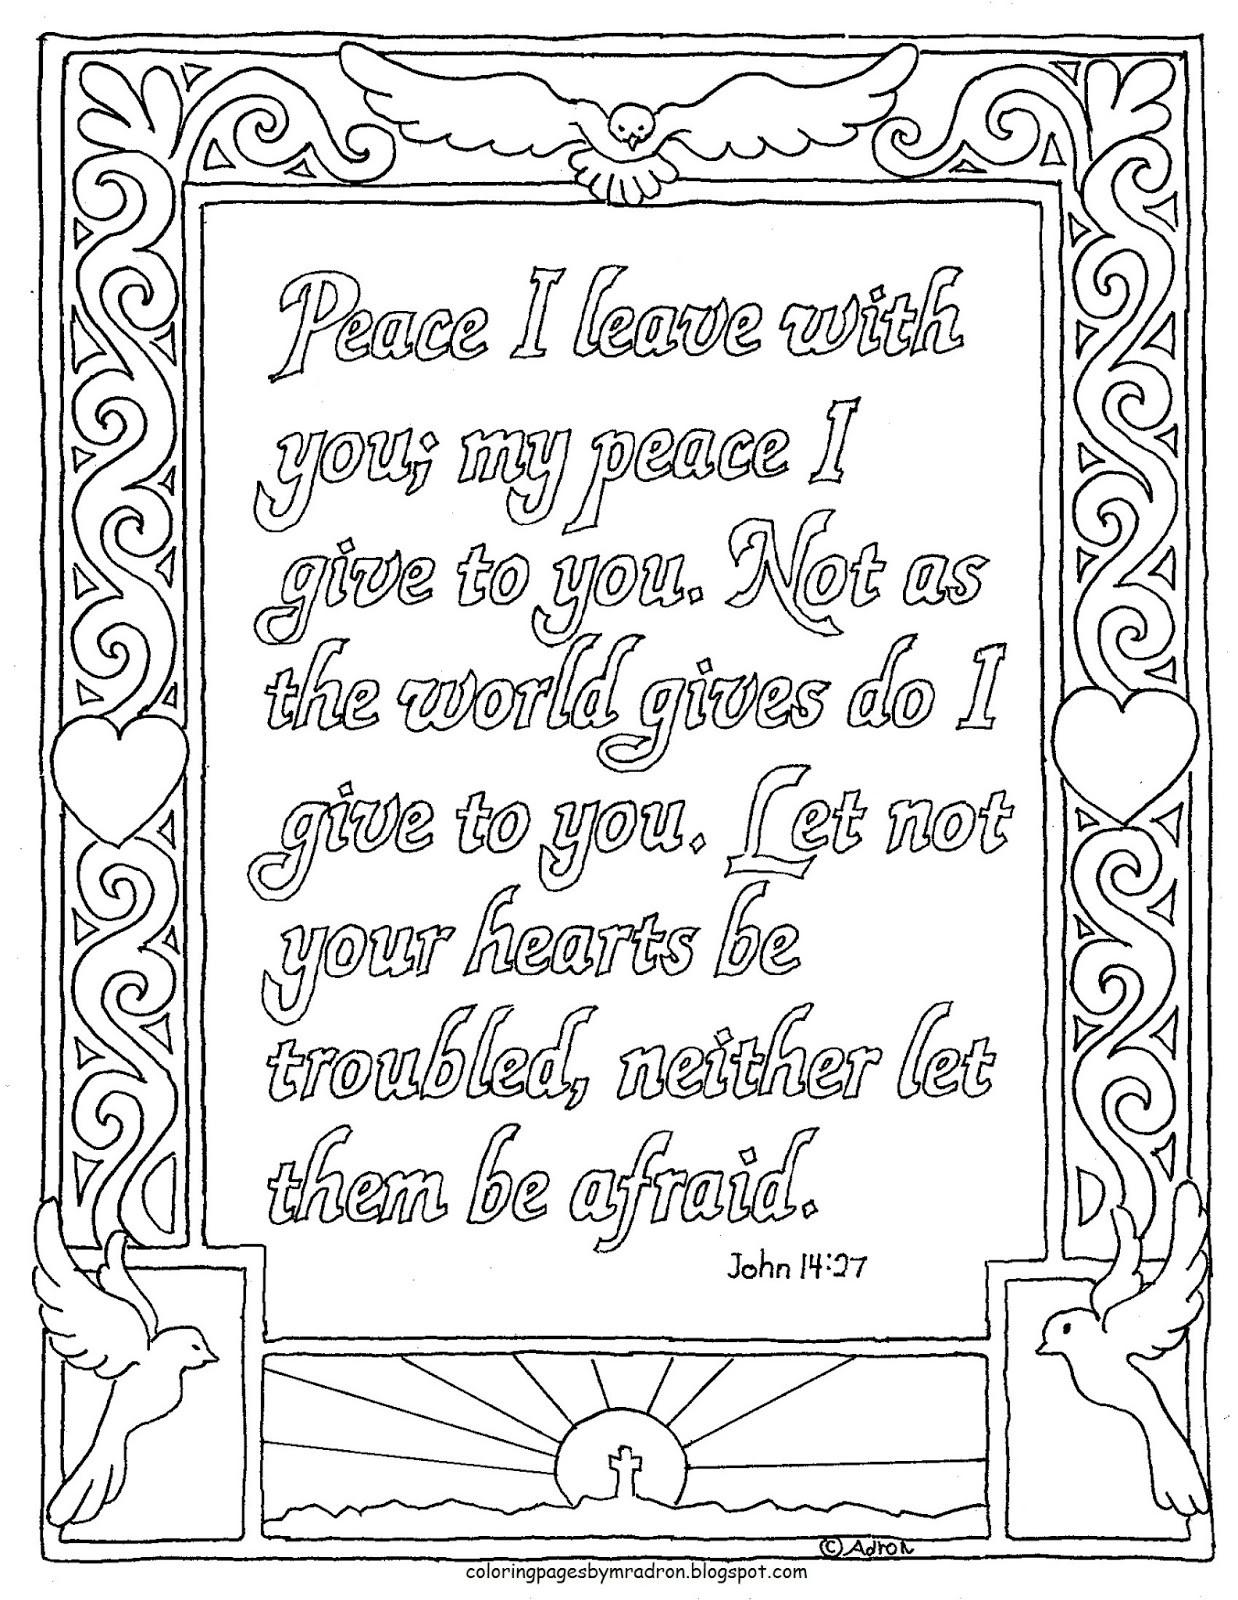 Fruits Of the Spirit Worksheet Free Fruit Of the Spirit Printables Huge List Youth Bible